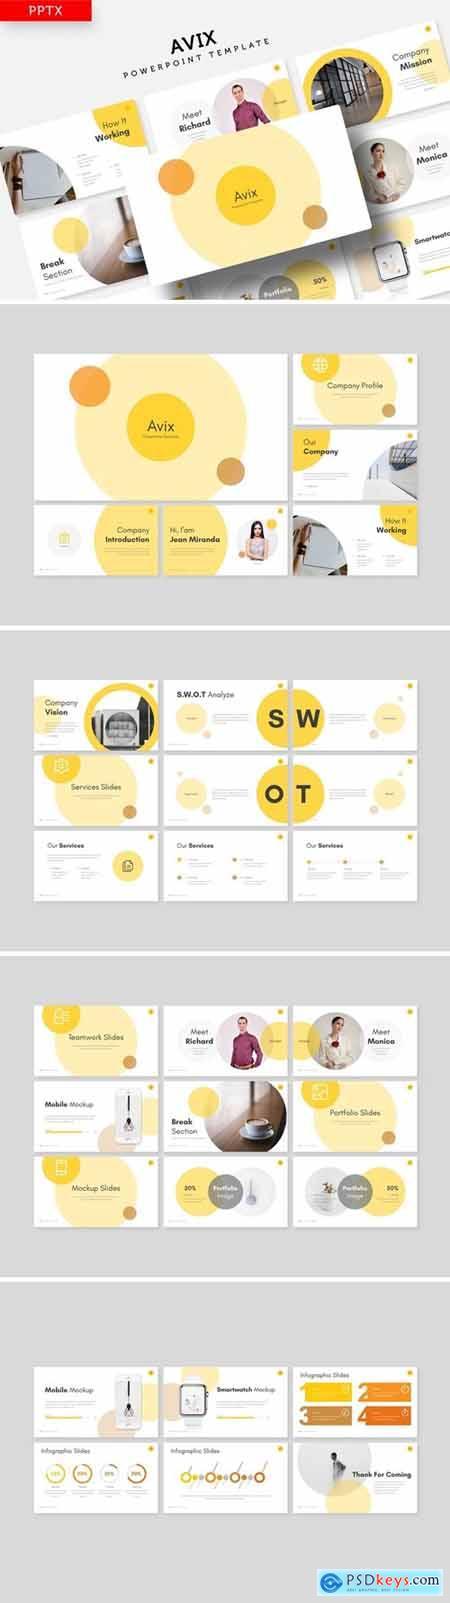 Avix Powerpoint, Keynote and Google Slides Templates